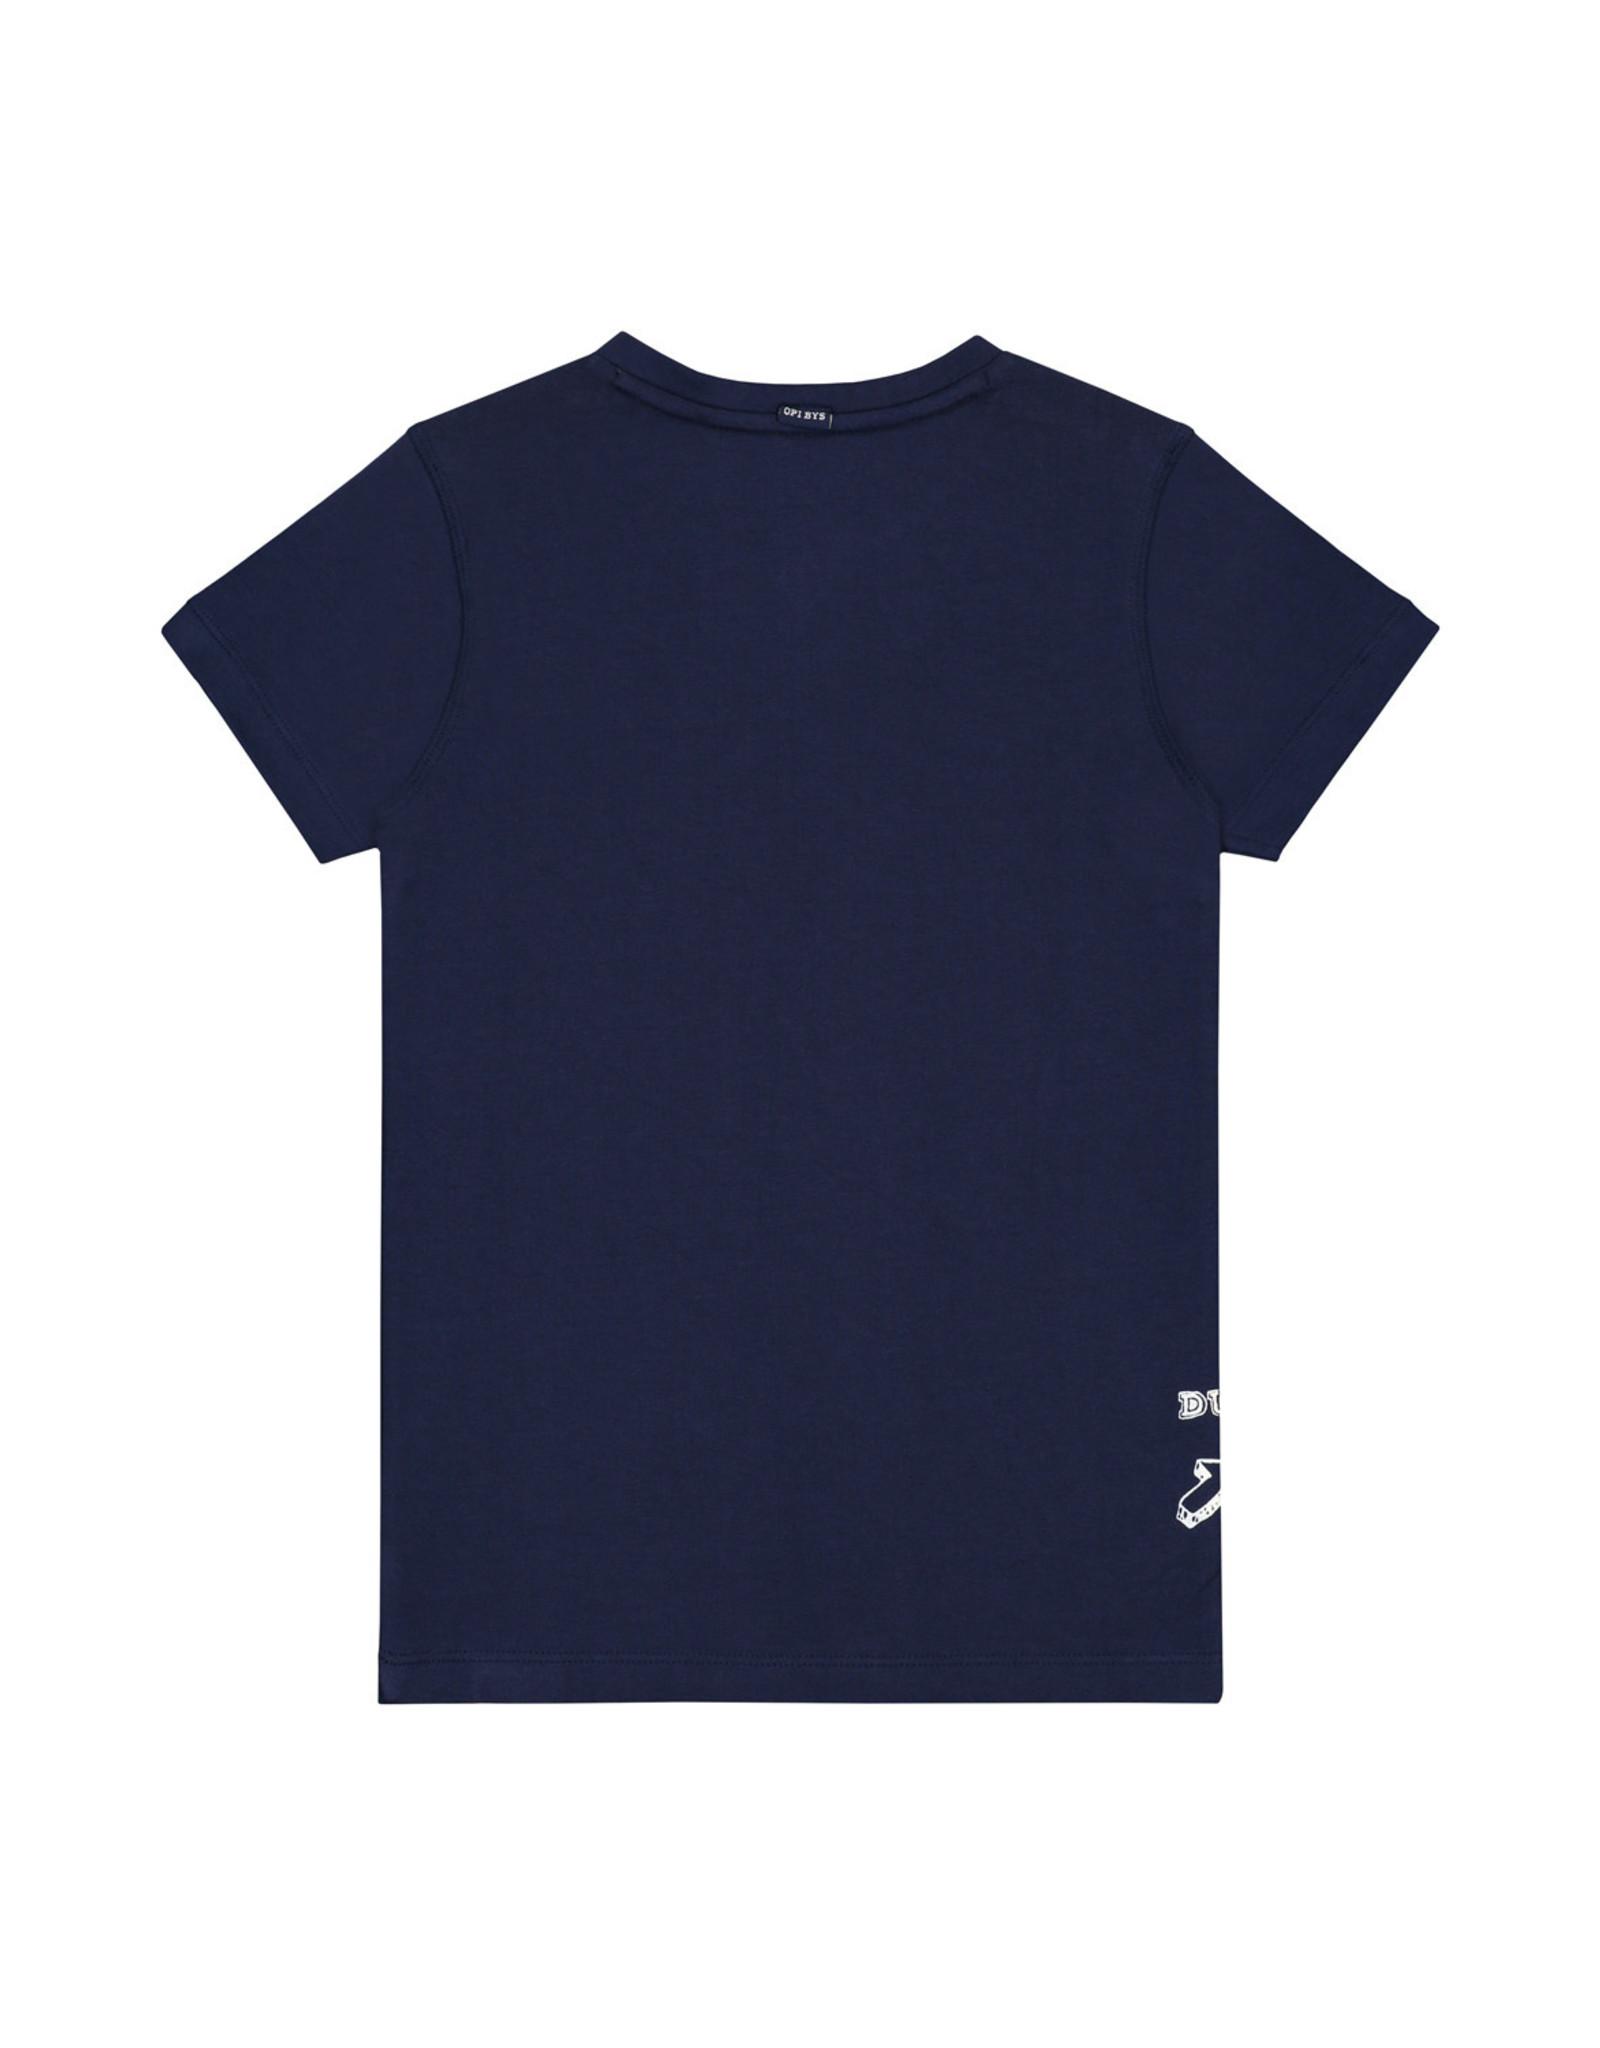 Quapi ALEC S201 Dark Blue